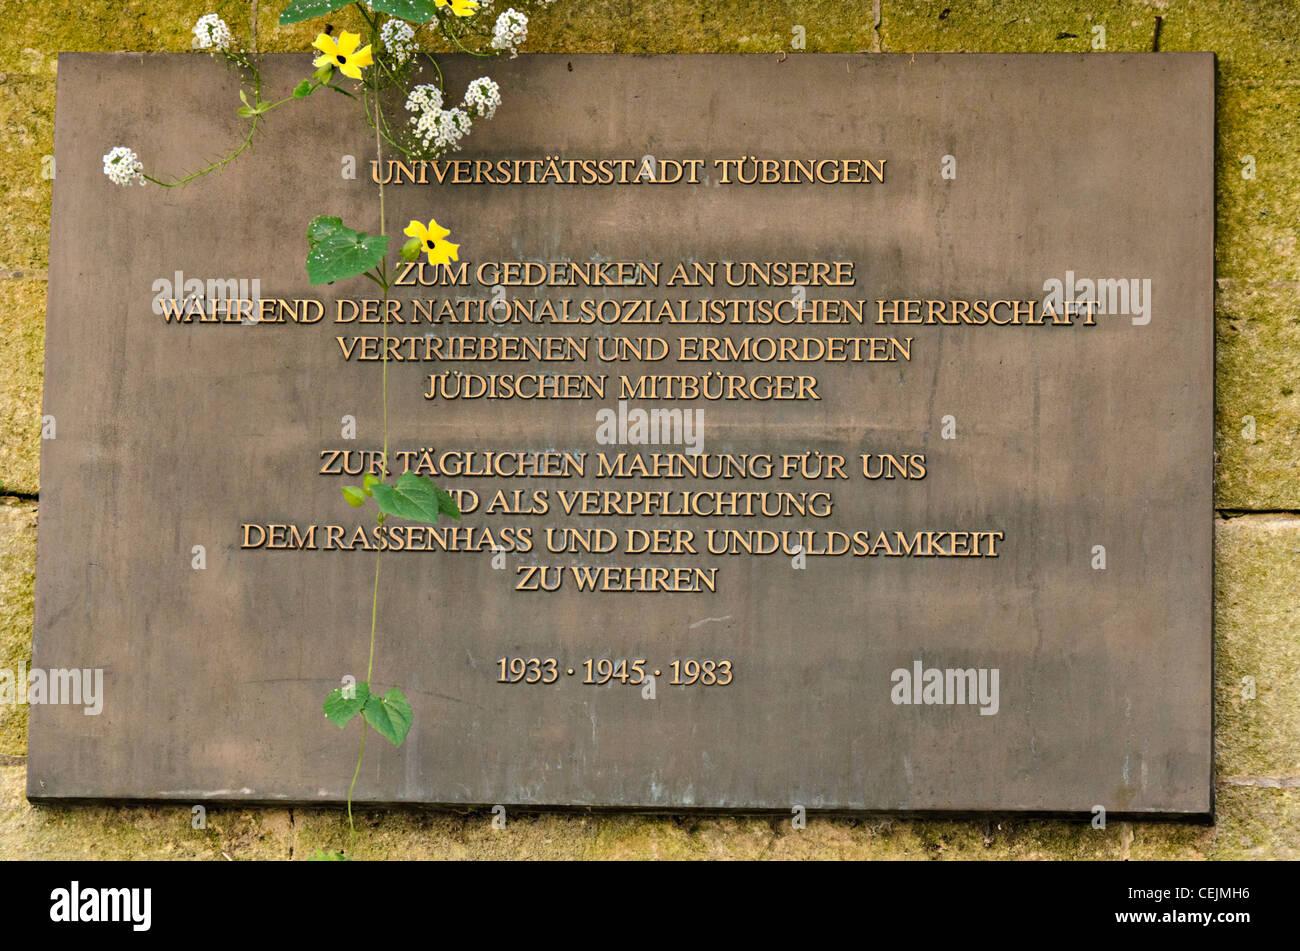 Memorial plaque to Jewish victims of the Nazis in Tübingen city center, 1933-1945-1983, Germany Stock Photo